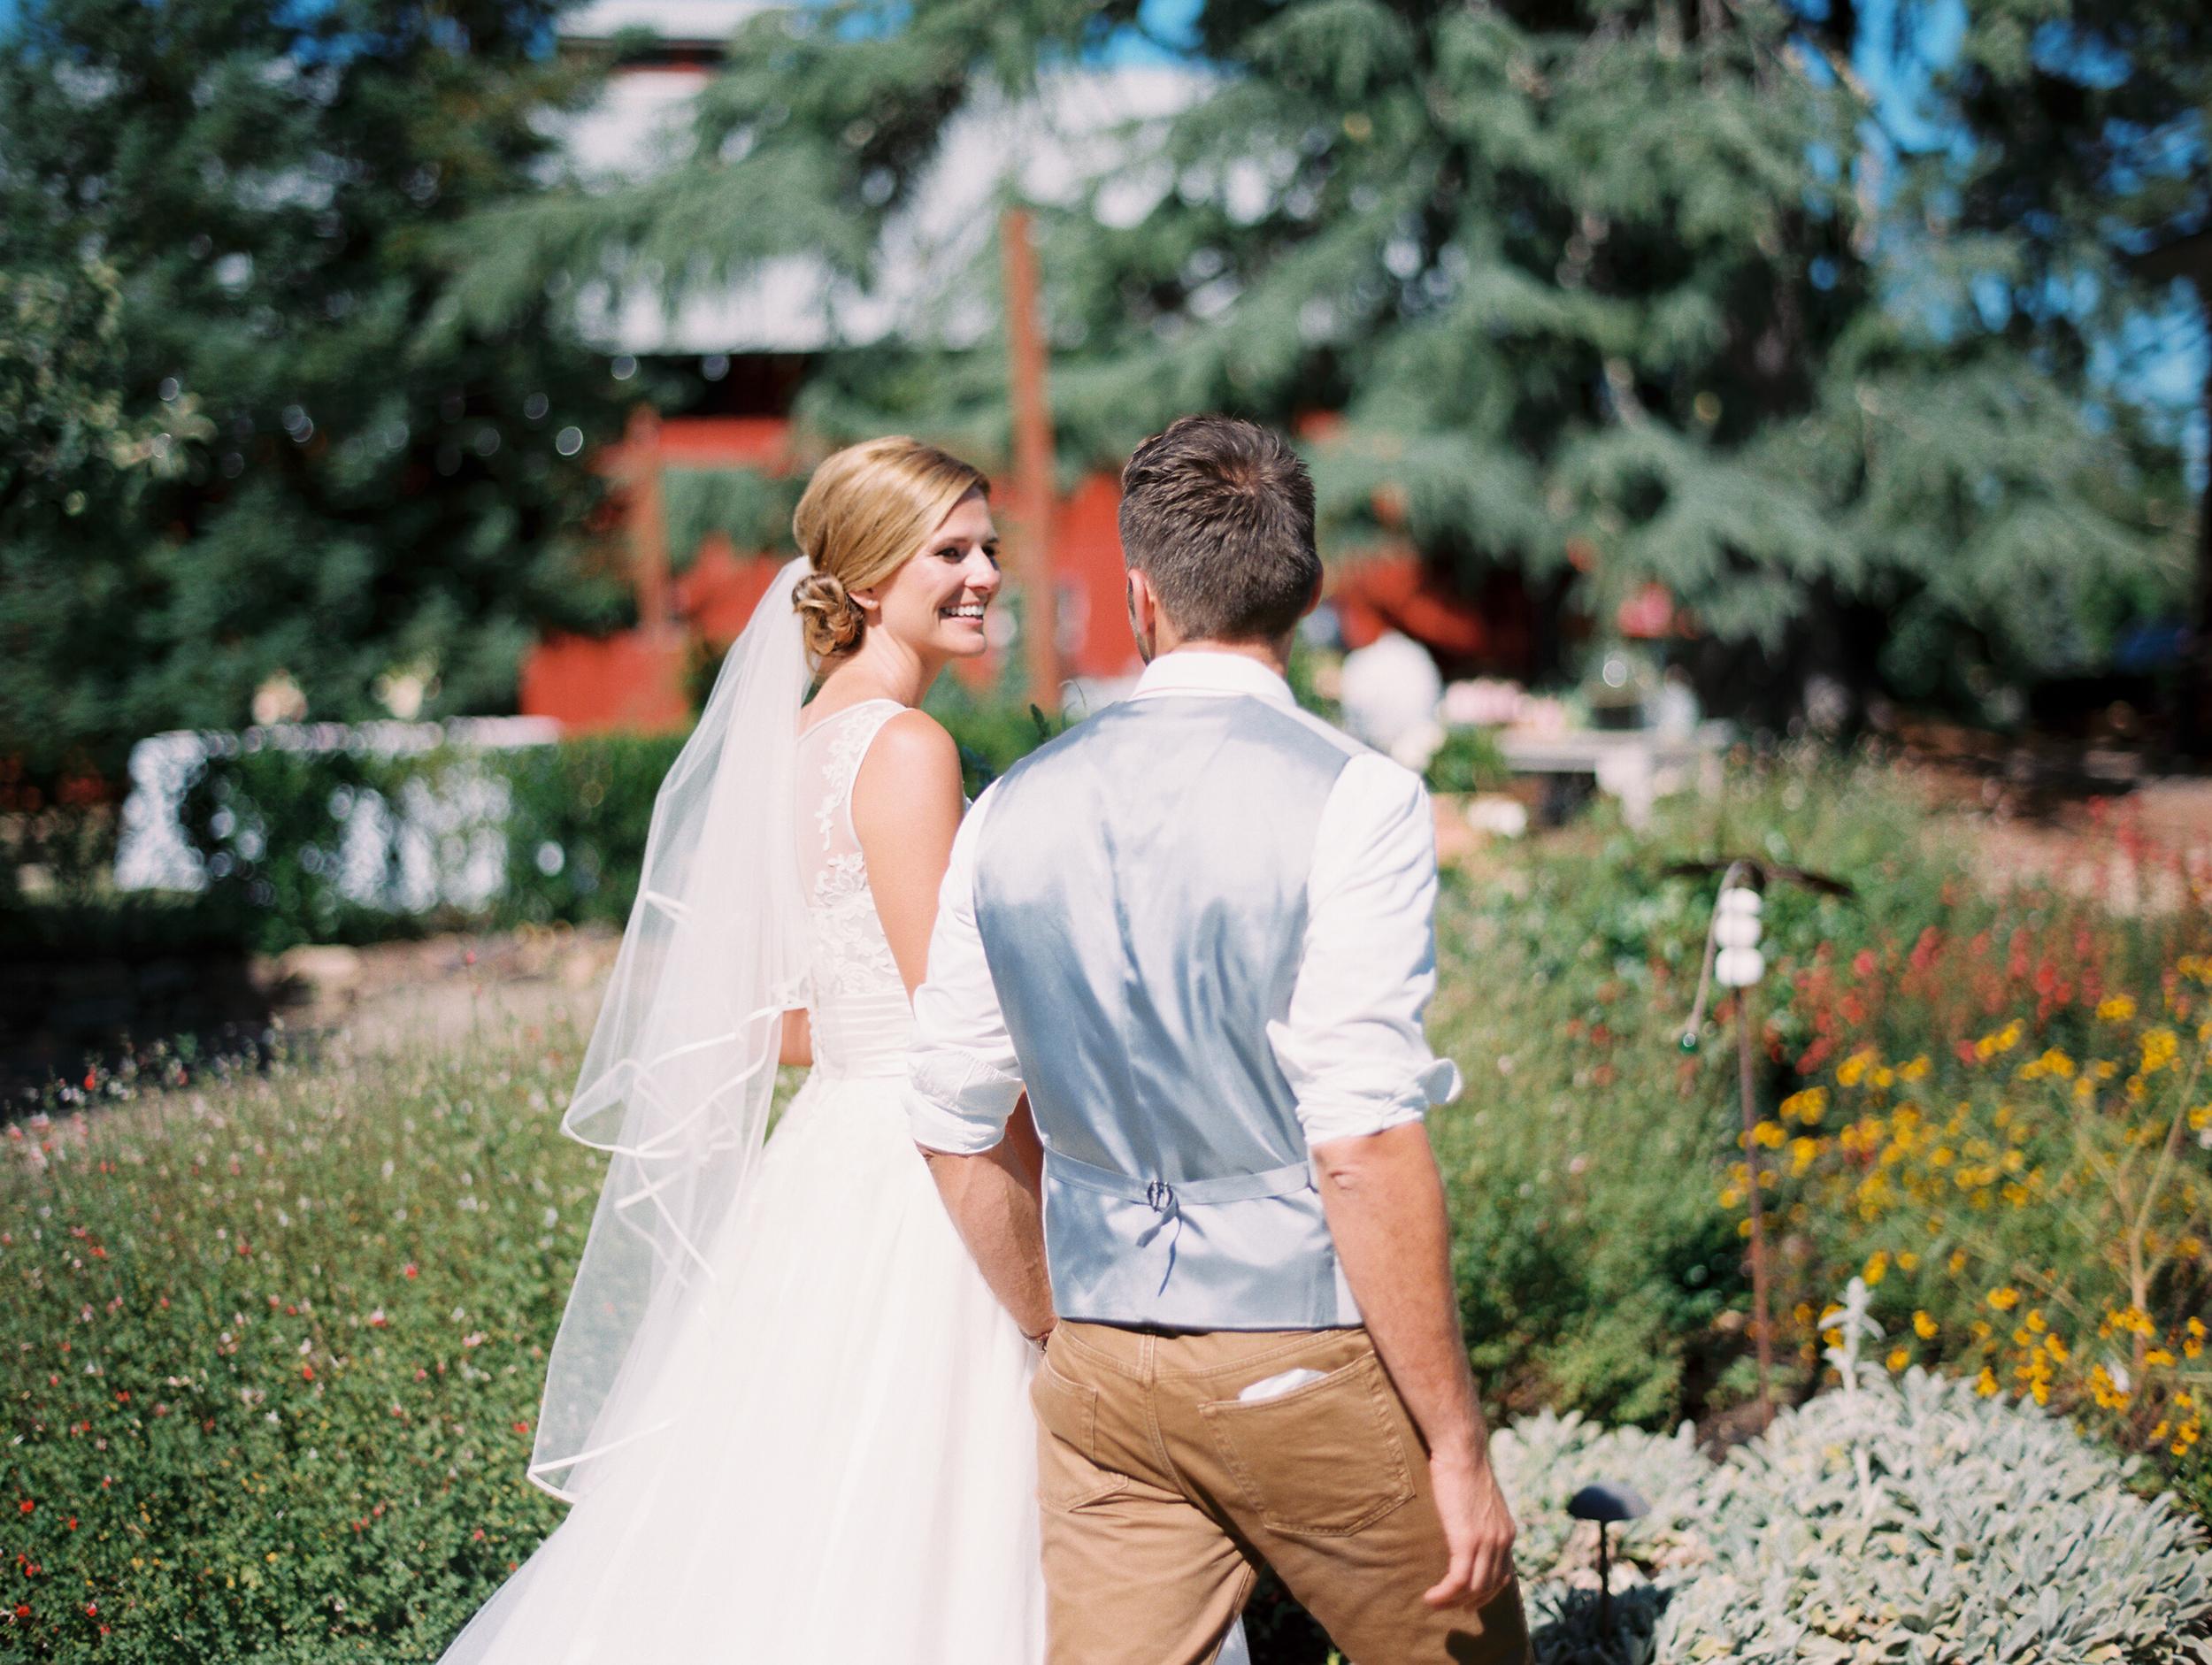 Anders Wedding by Jessica Garmon-193.JPG